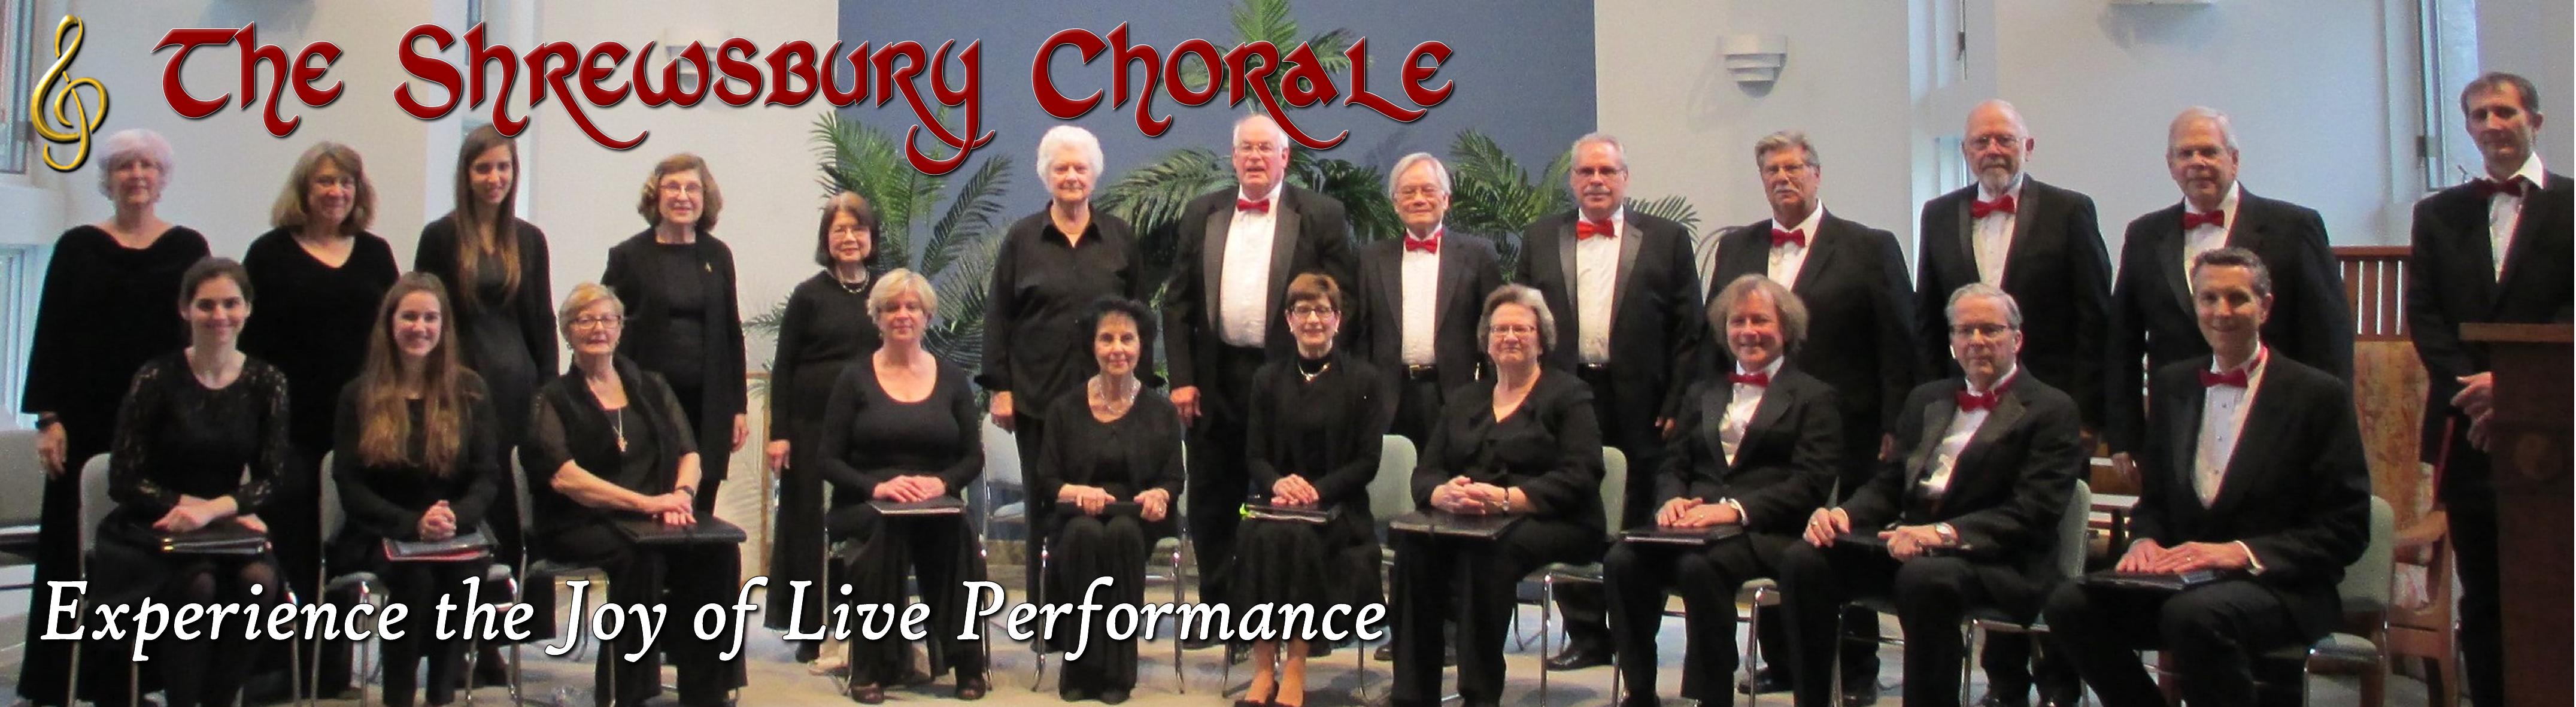 The Shrewsbury Chorale